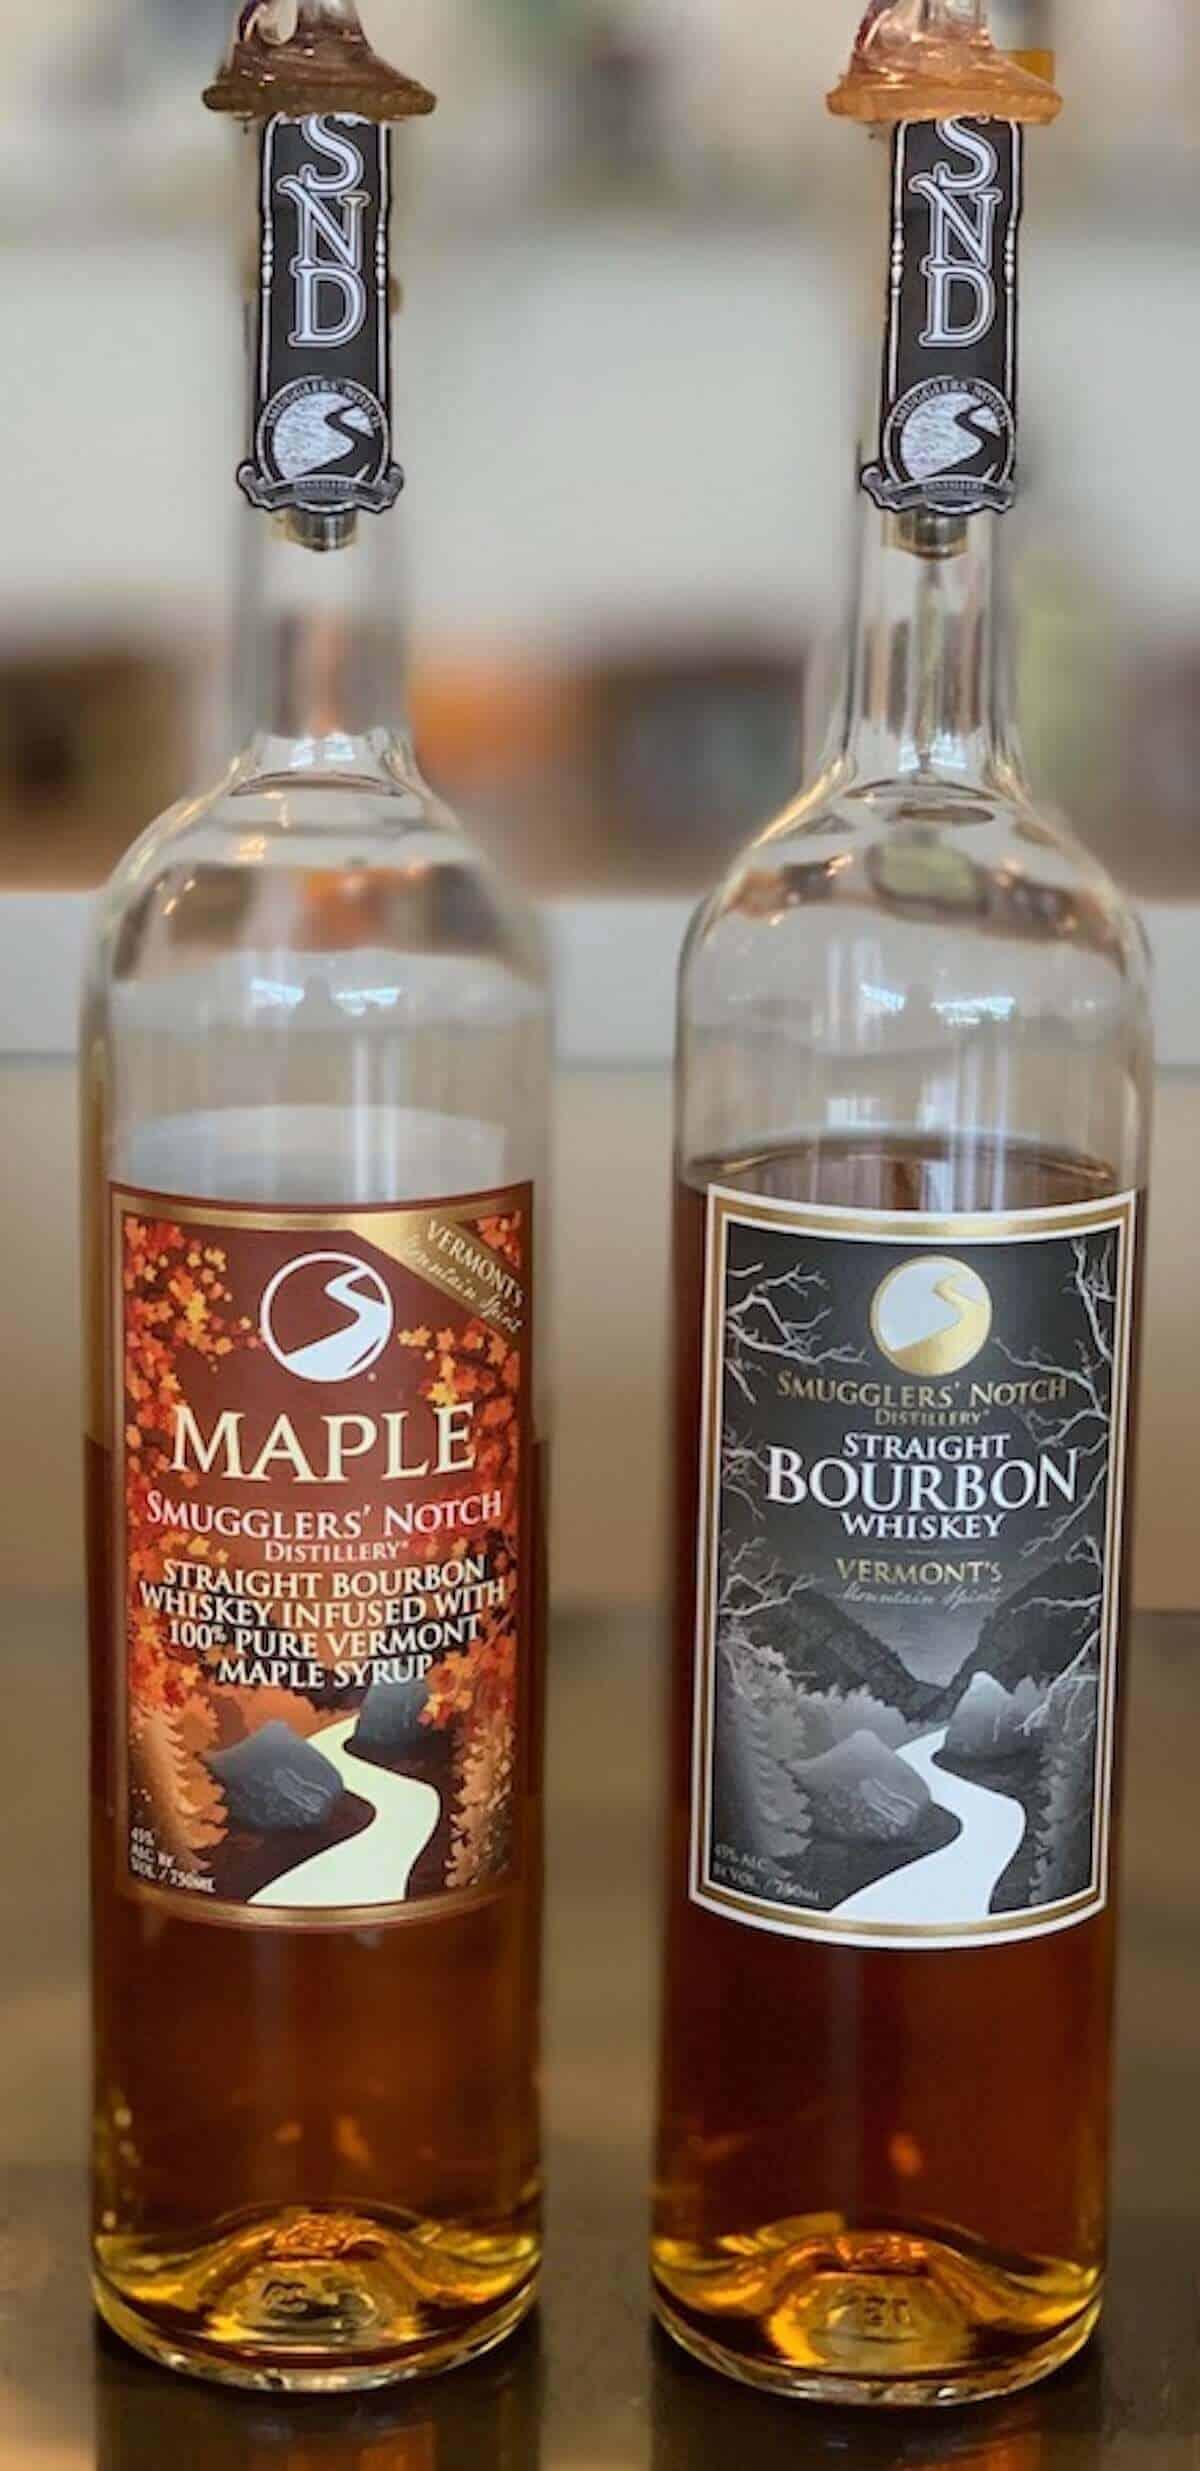 Smugglers' Notch Distillery Straight Bourbon Maple Bourbon